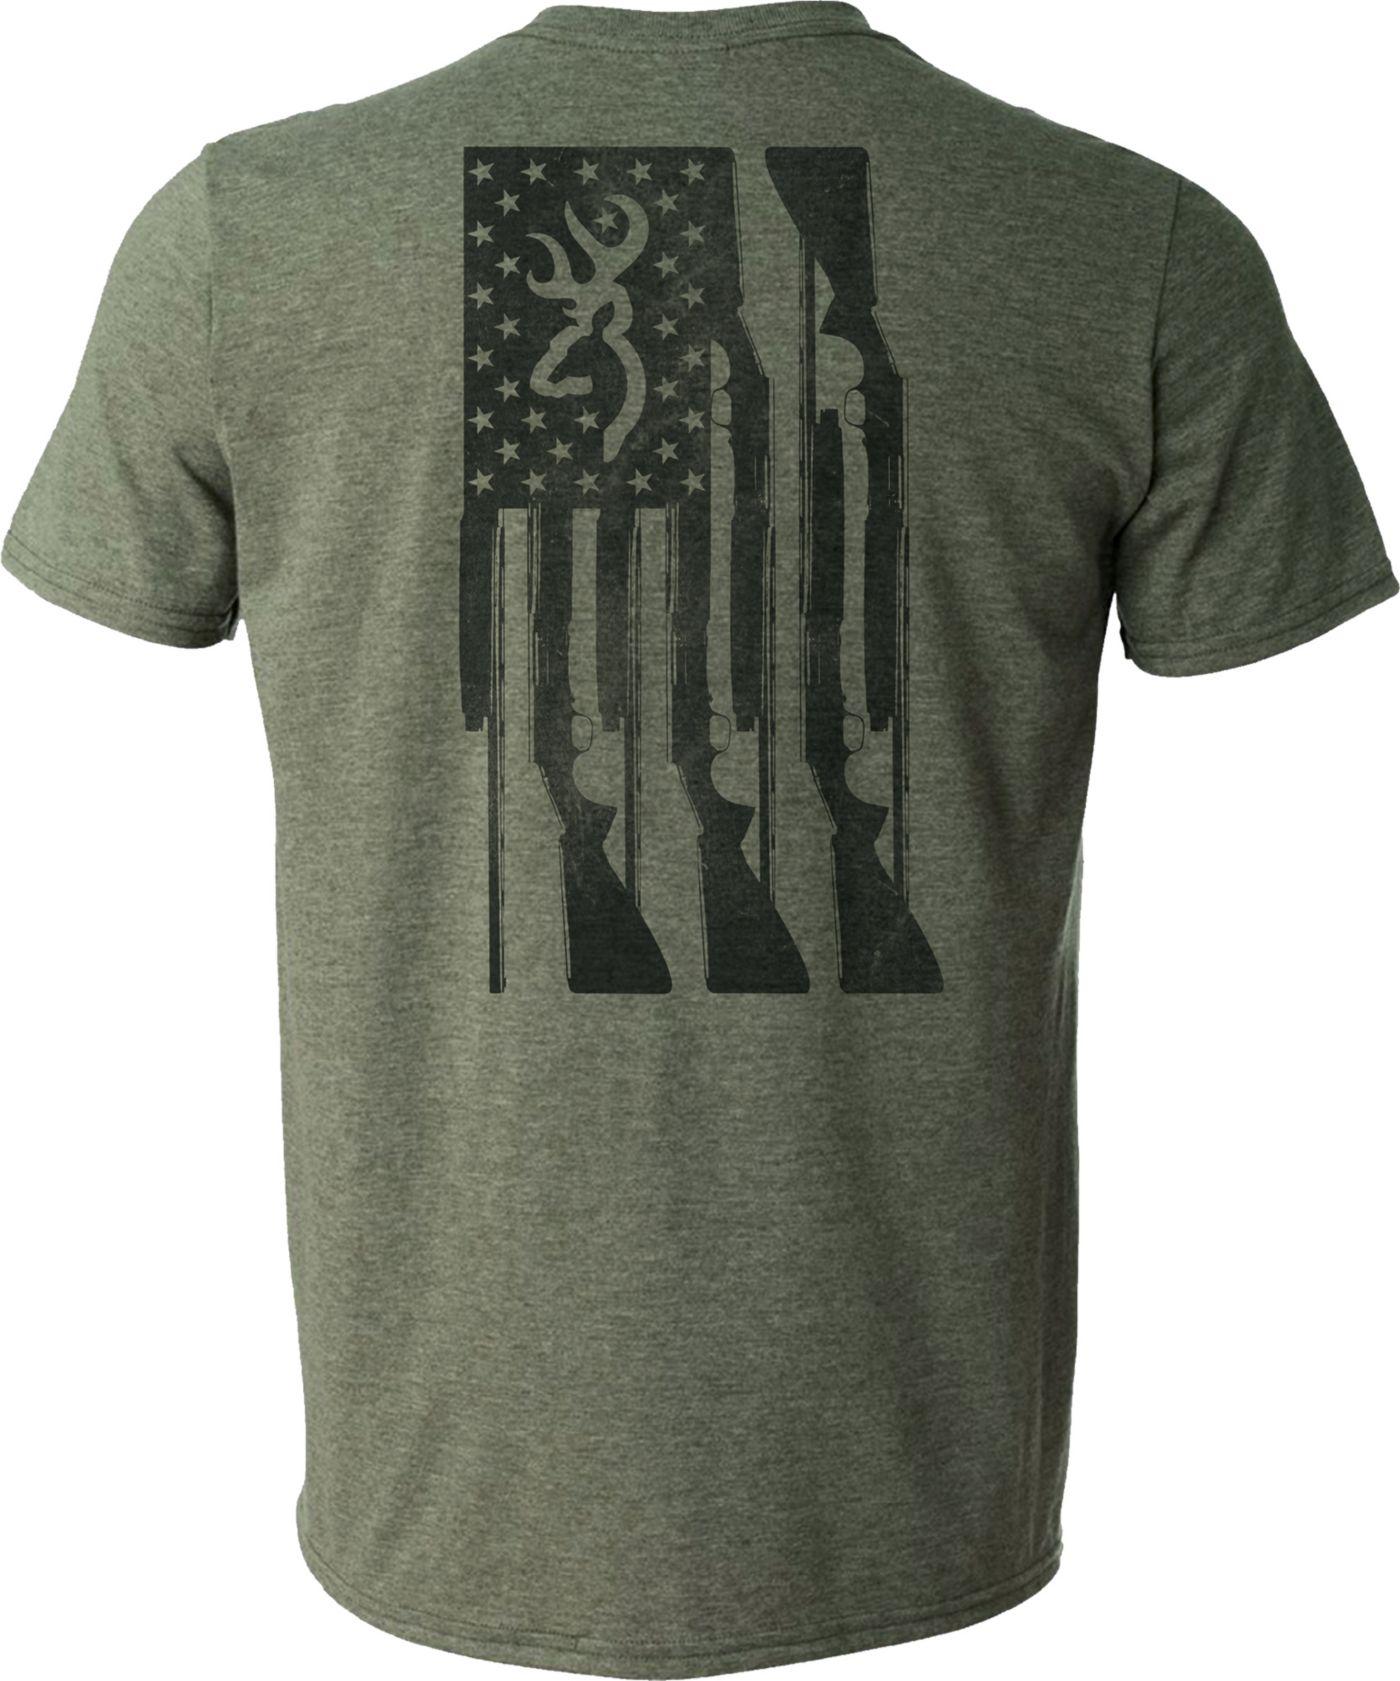 Browning Men's Rifle Flag T-Shirt